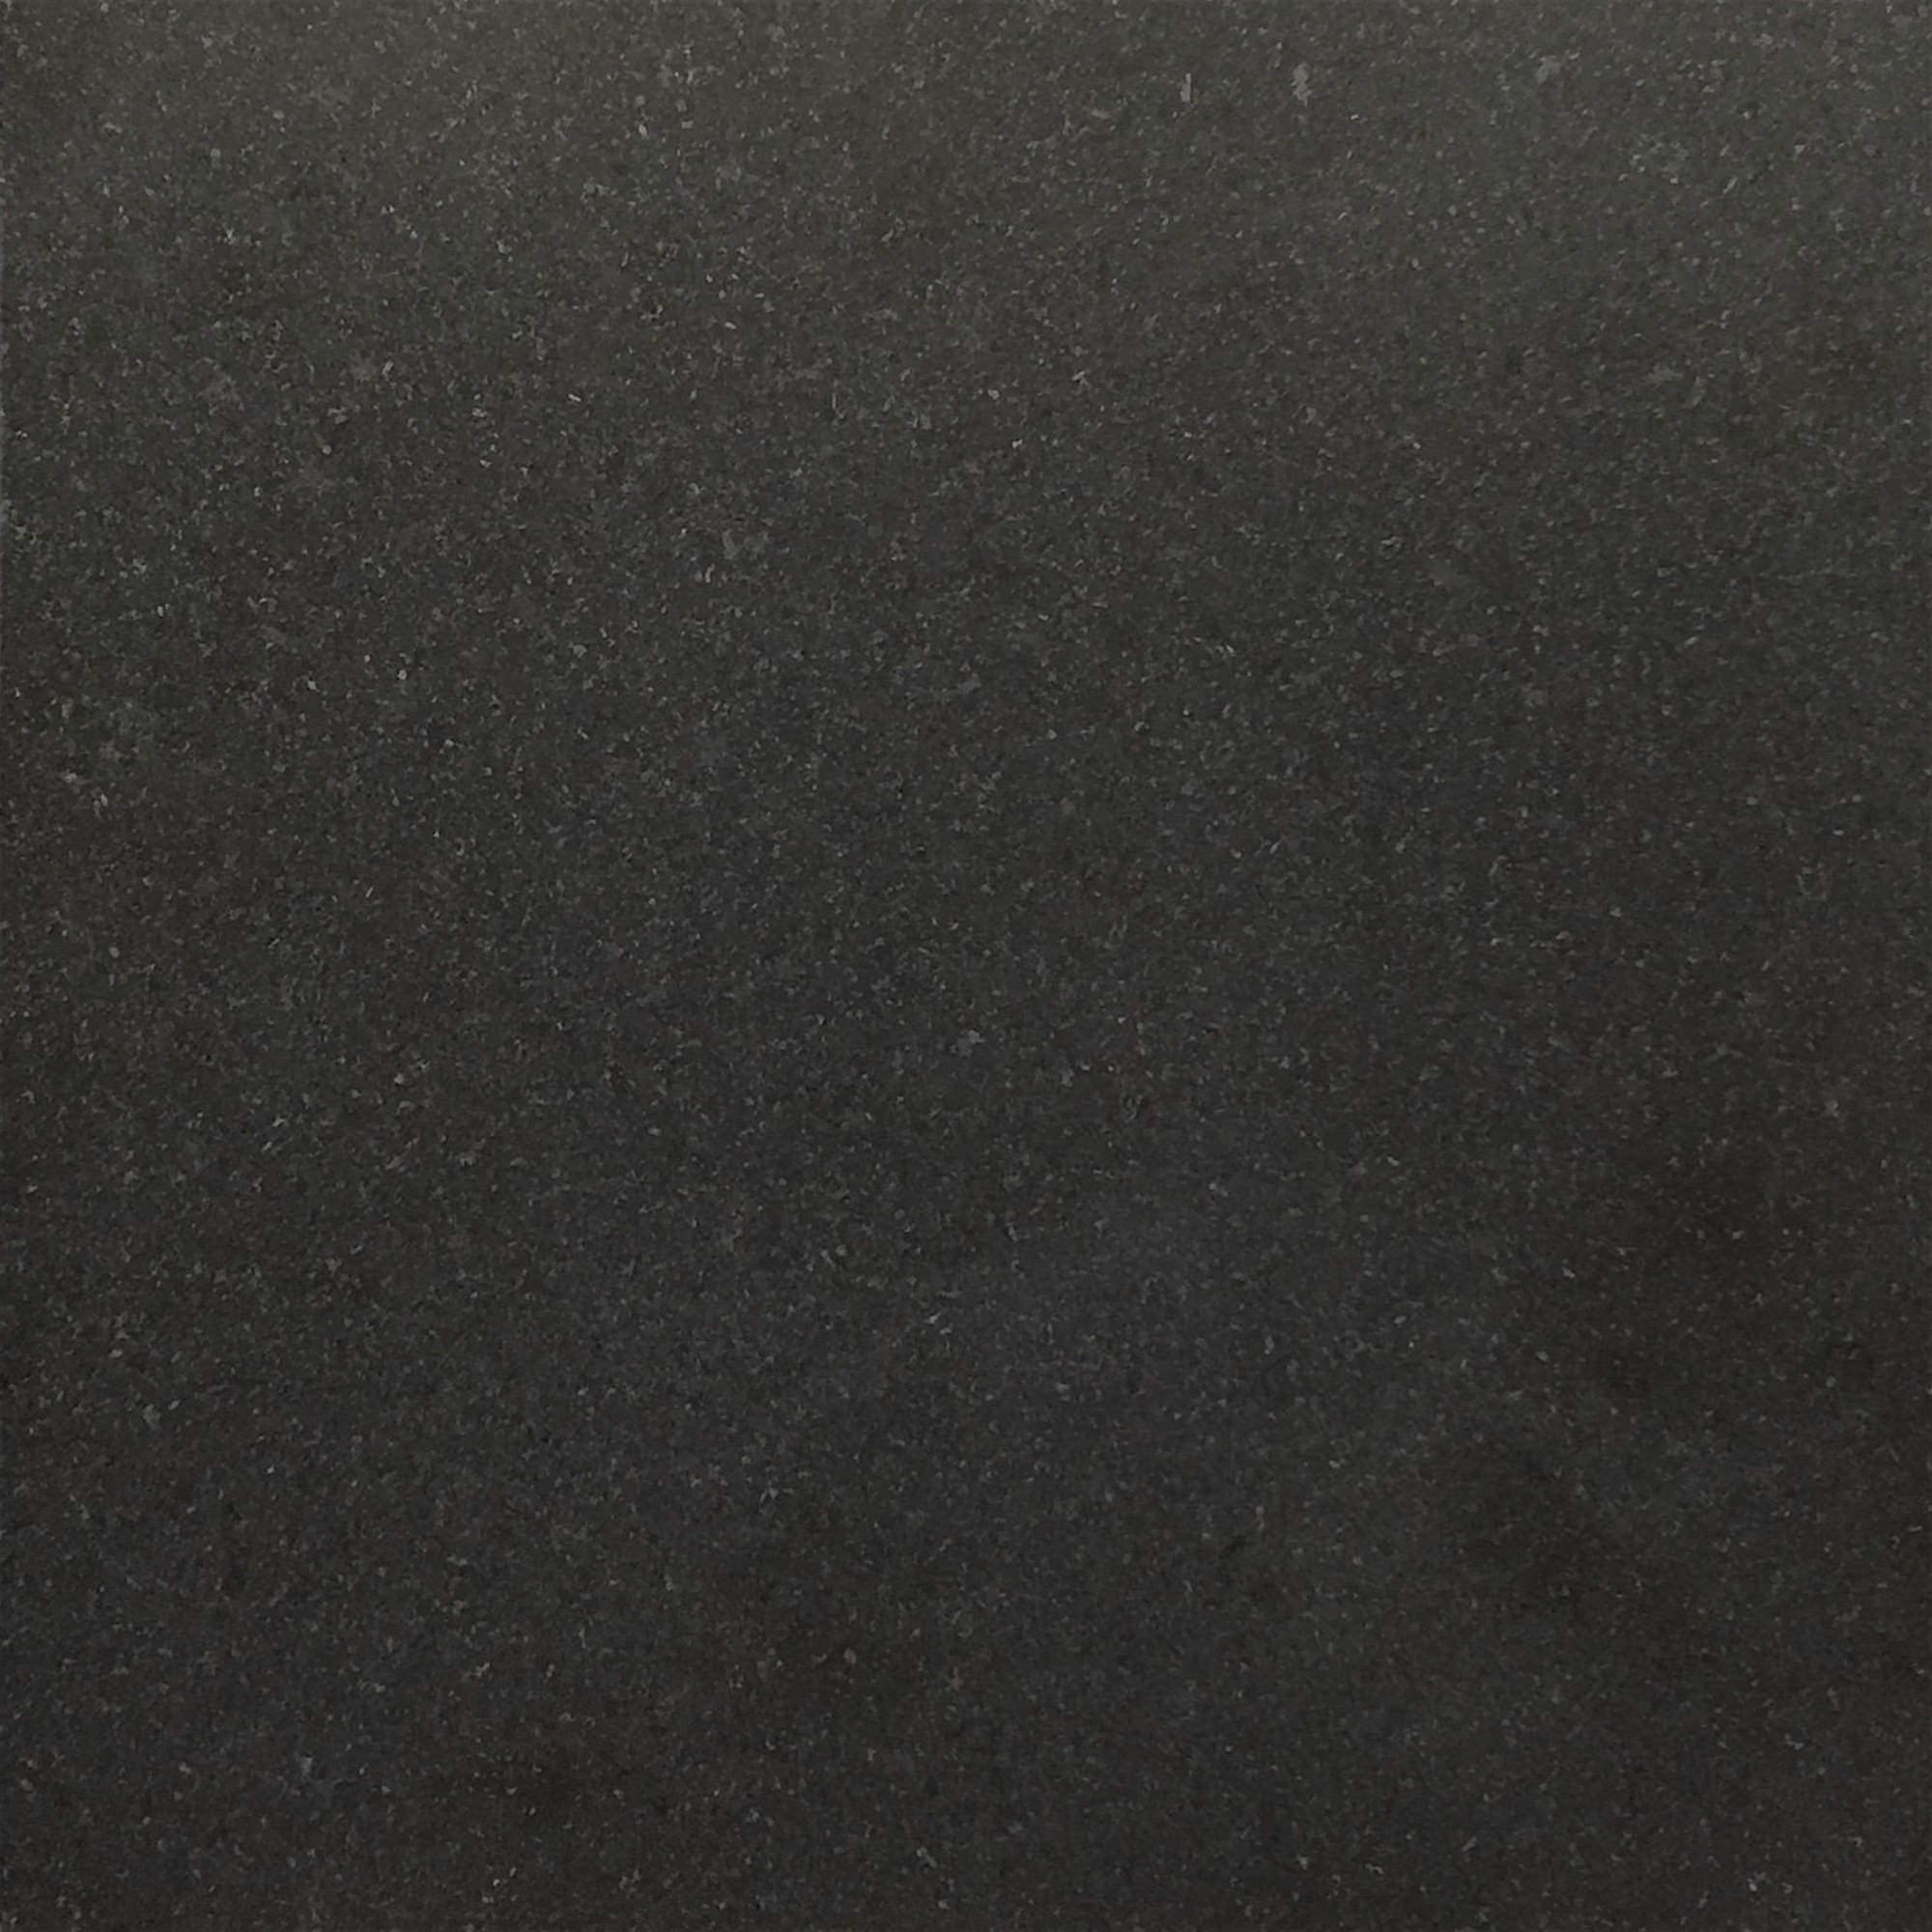 SUPREME BLACK